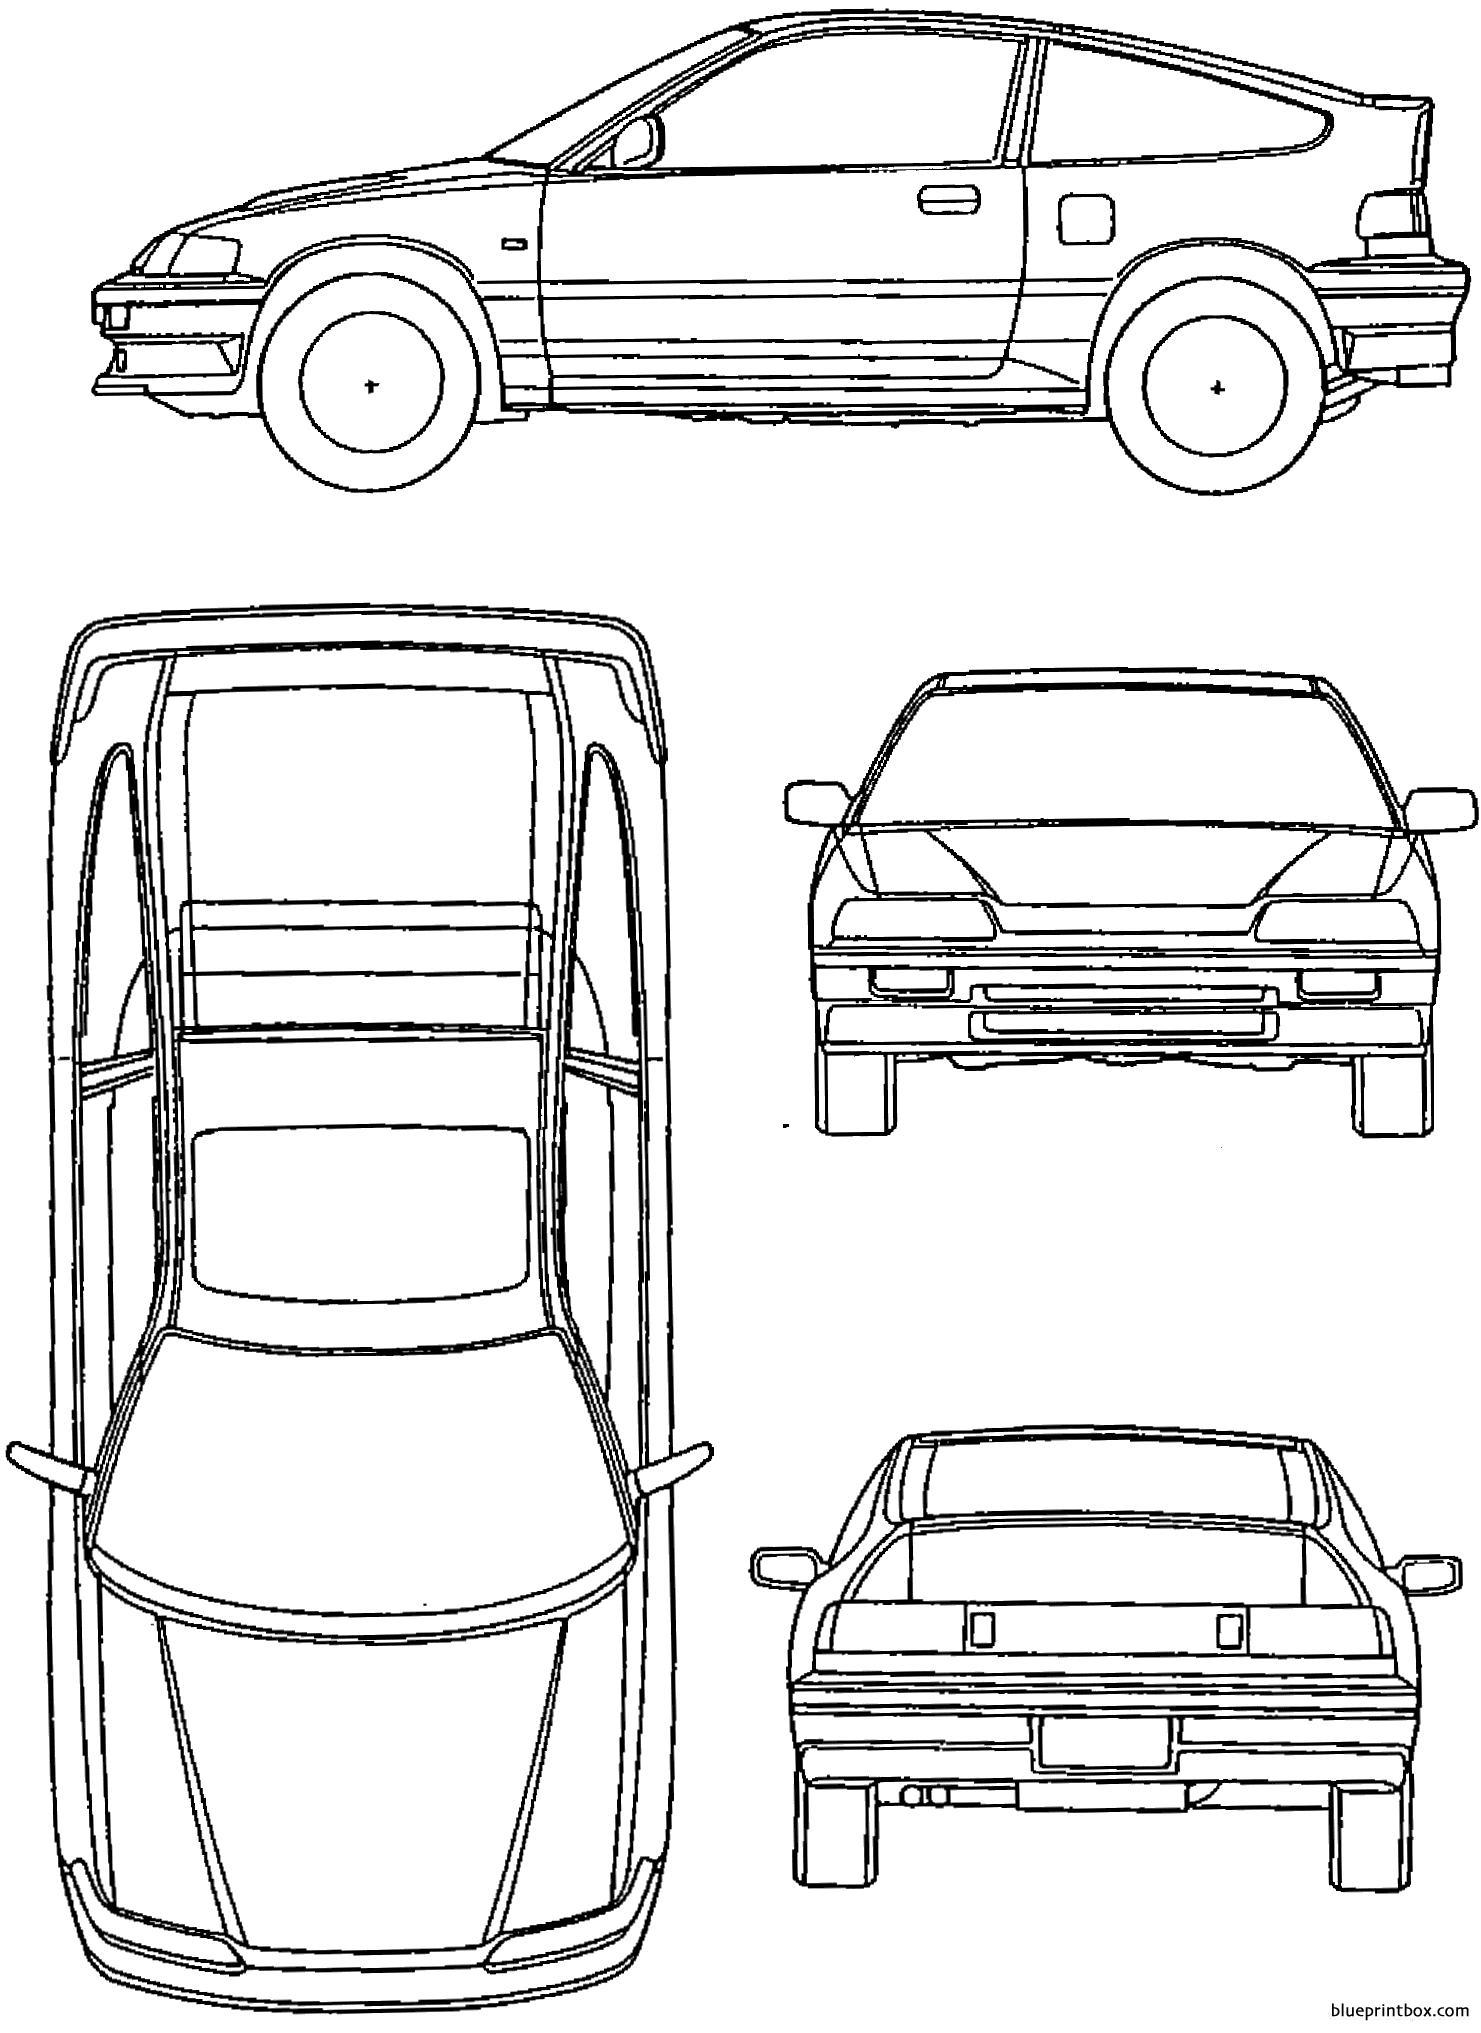 Honda Crx 90 Mk2